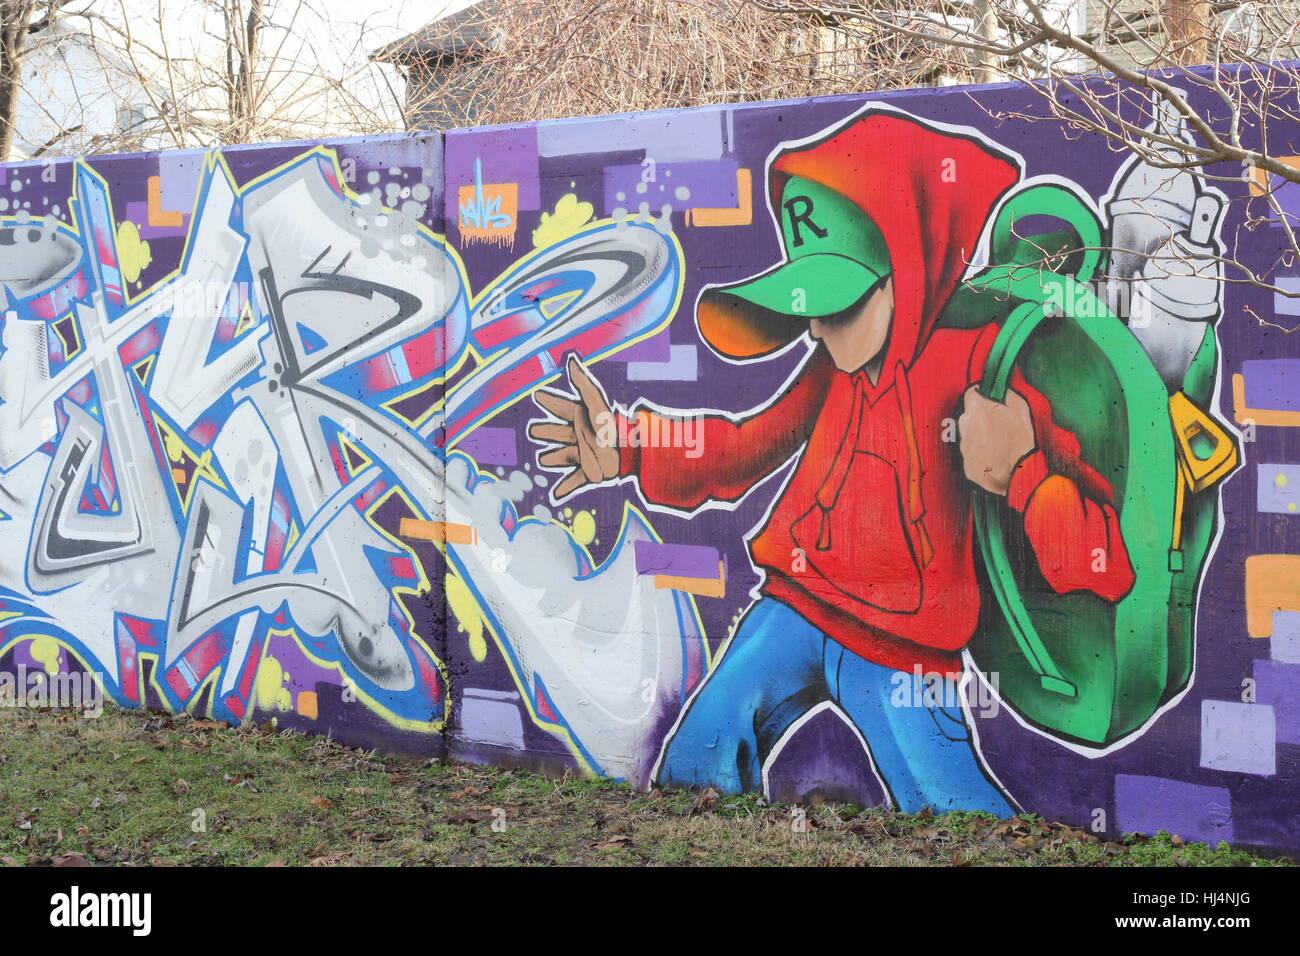 Graffiti wall usa - Graffiti Painted On A Wall Along The Rivergreenway In Fort Wayne Indiana Usa